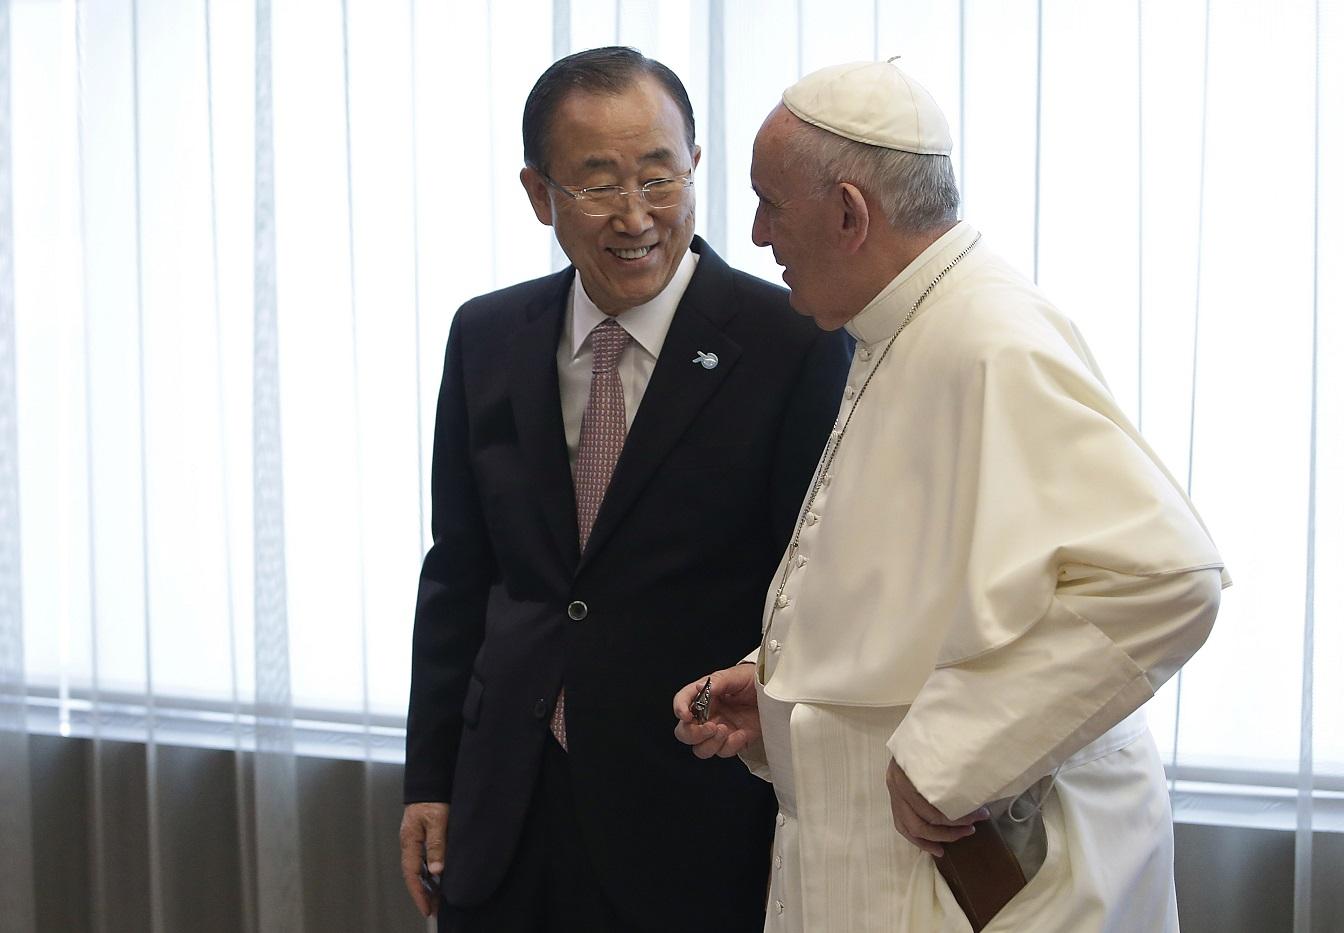 http://www.koreatimesus.com/wp-content/uploads/2015/09/pope-ban3.jpg